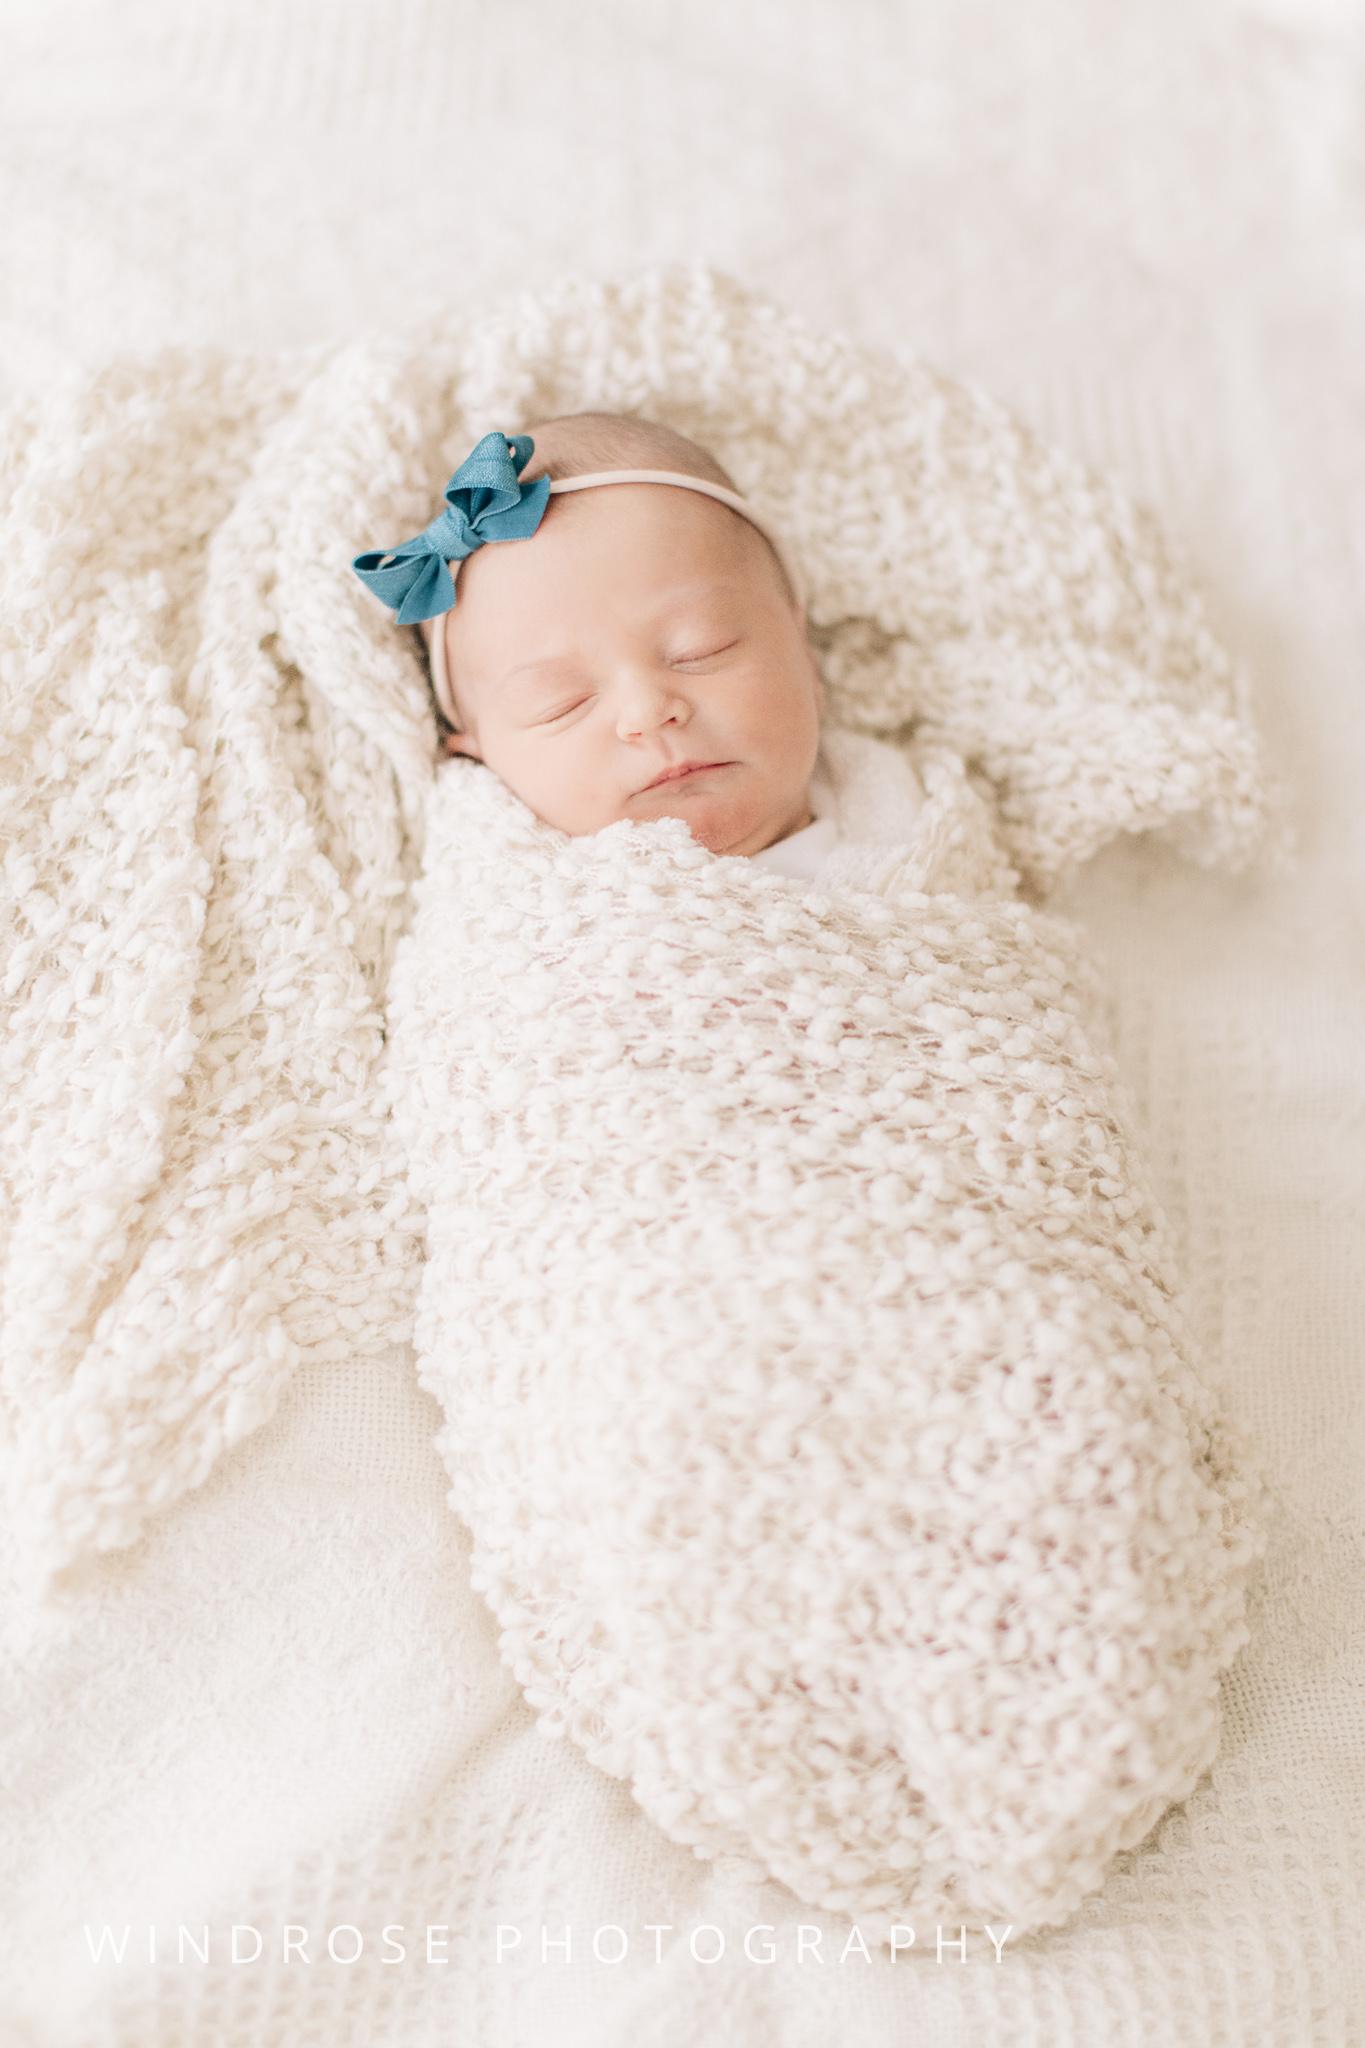 Newborn-Photography-Session-Rochester-MN-4.jpg